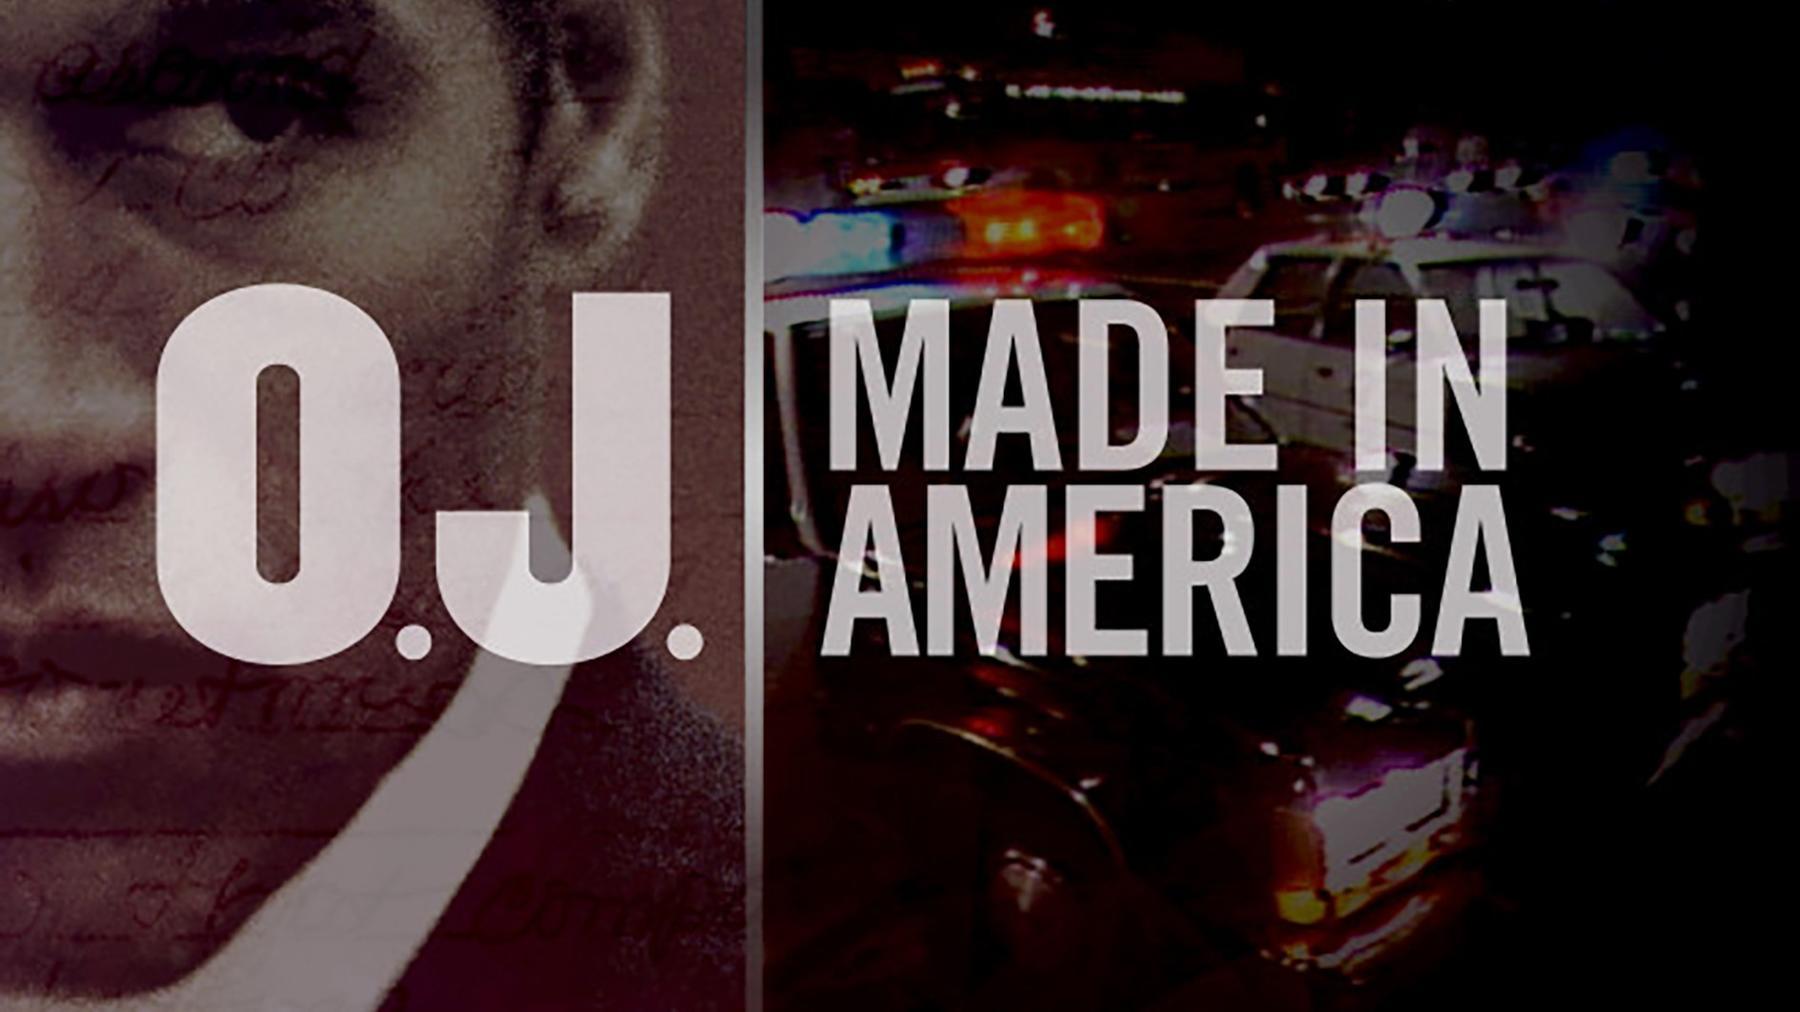 O.J. - Made in America